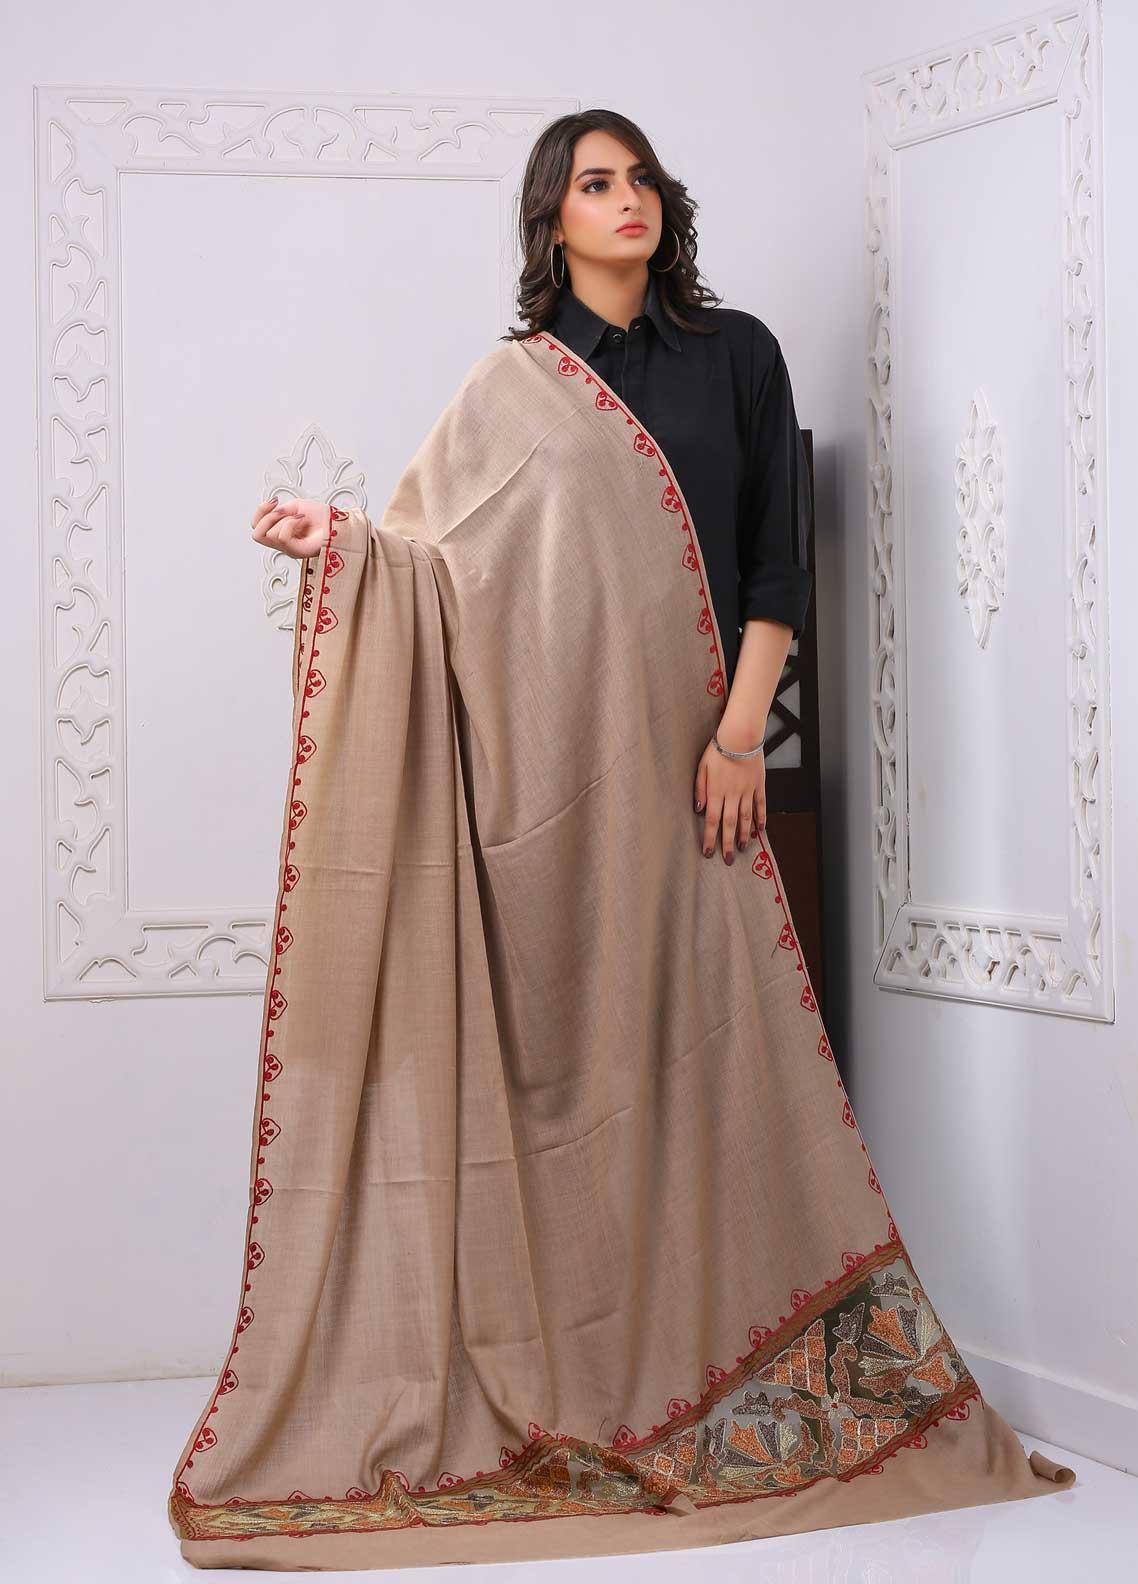 Sanaulla Exclusive Range Embroidered Pashmina  Shawl PMSH 323814 Cut Work  - Pashmina Cut Work Shawls